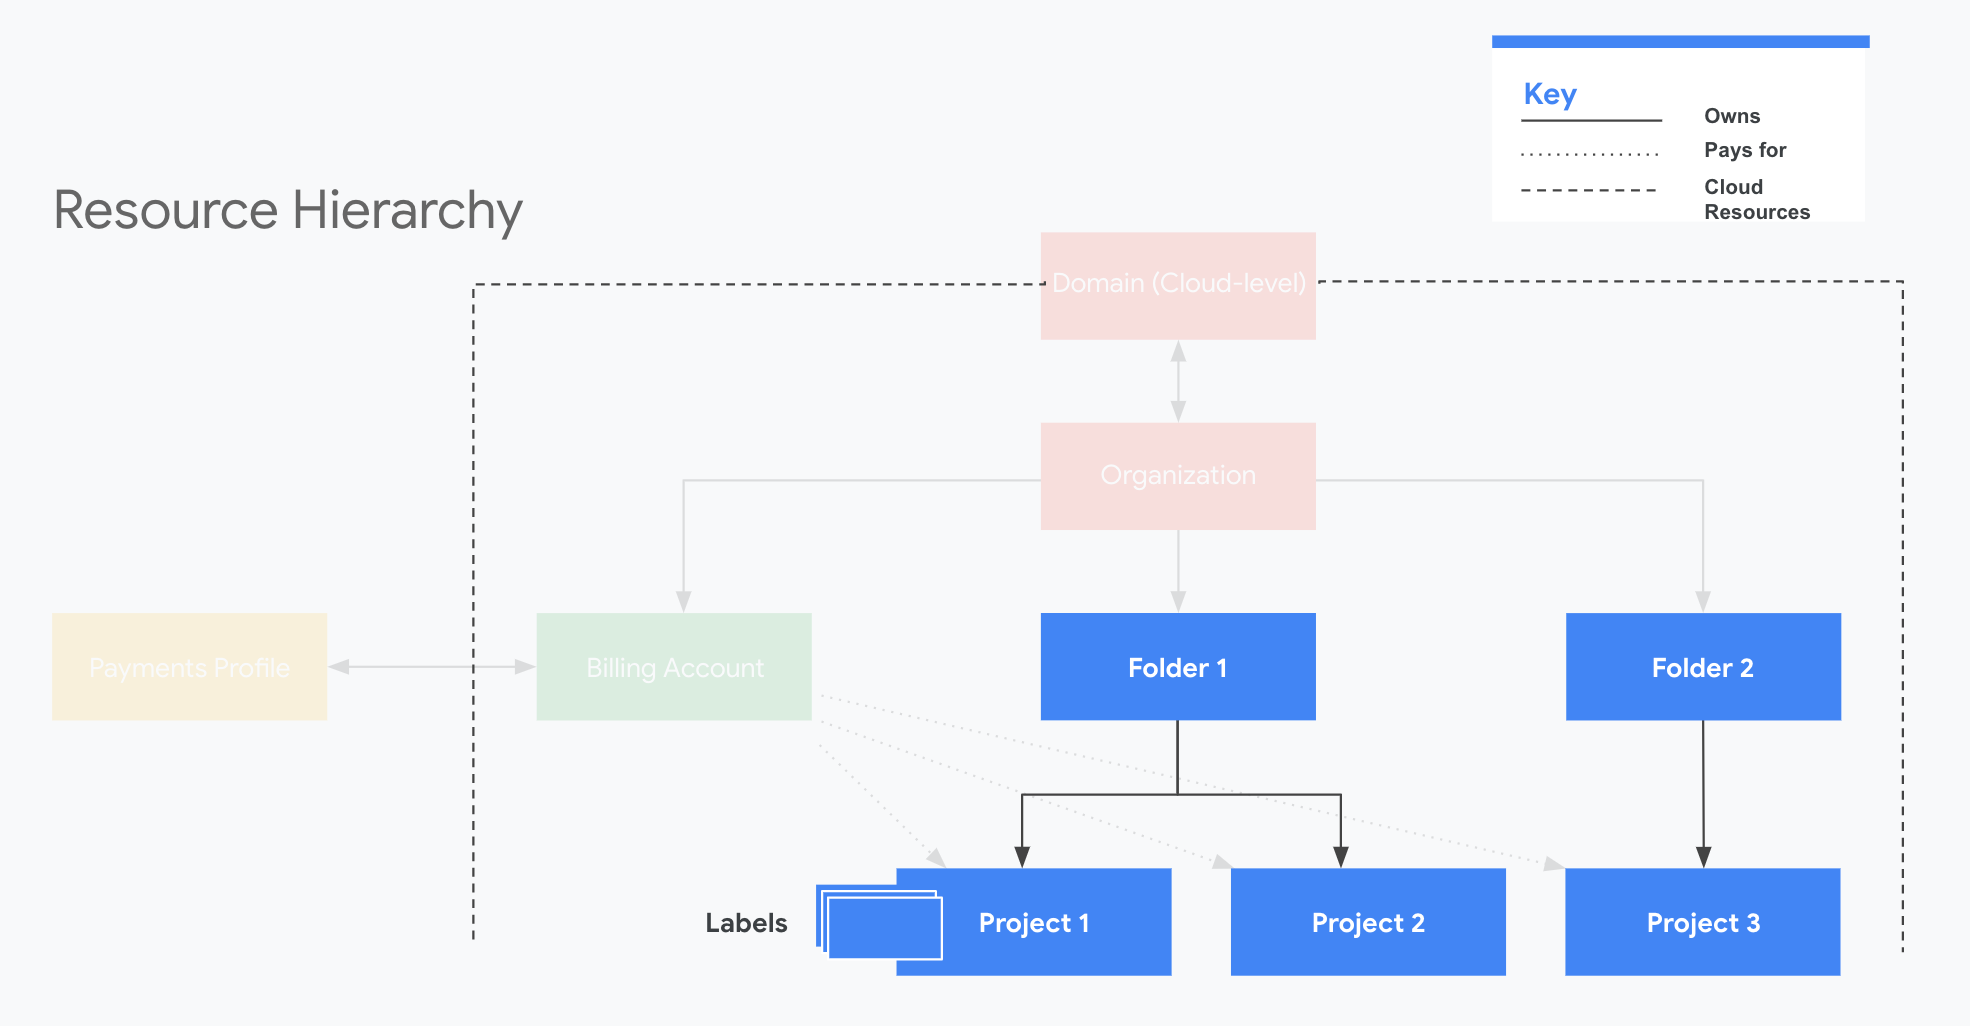 Projetos, pastas e rótulos na hierarquia de recursos